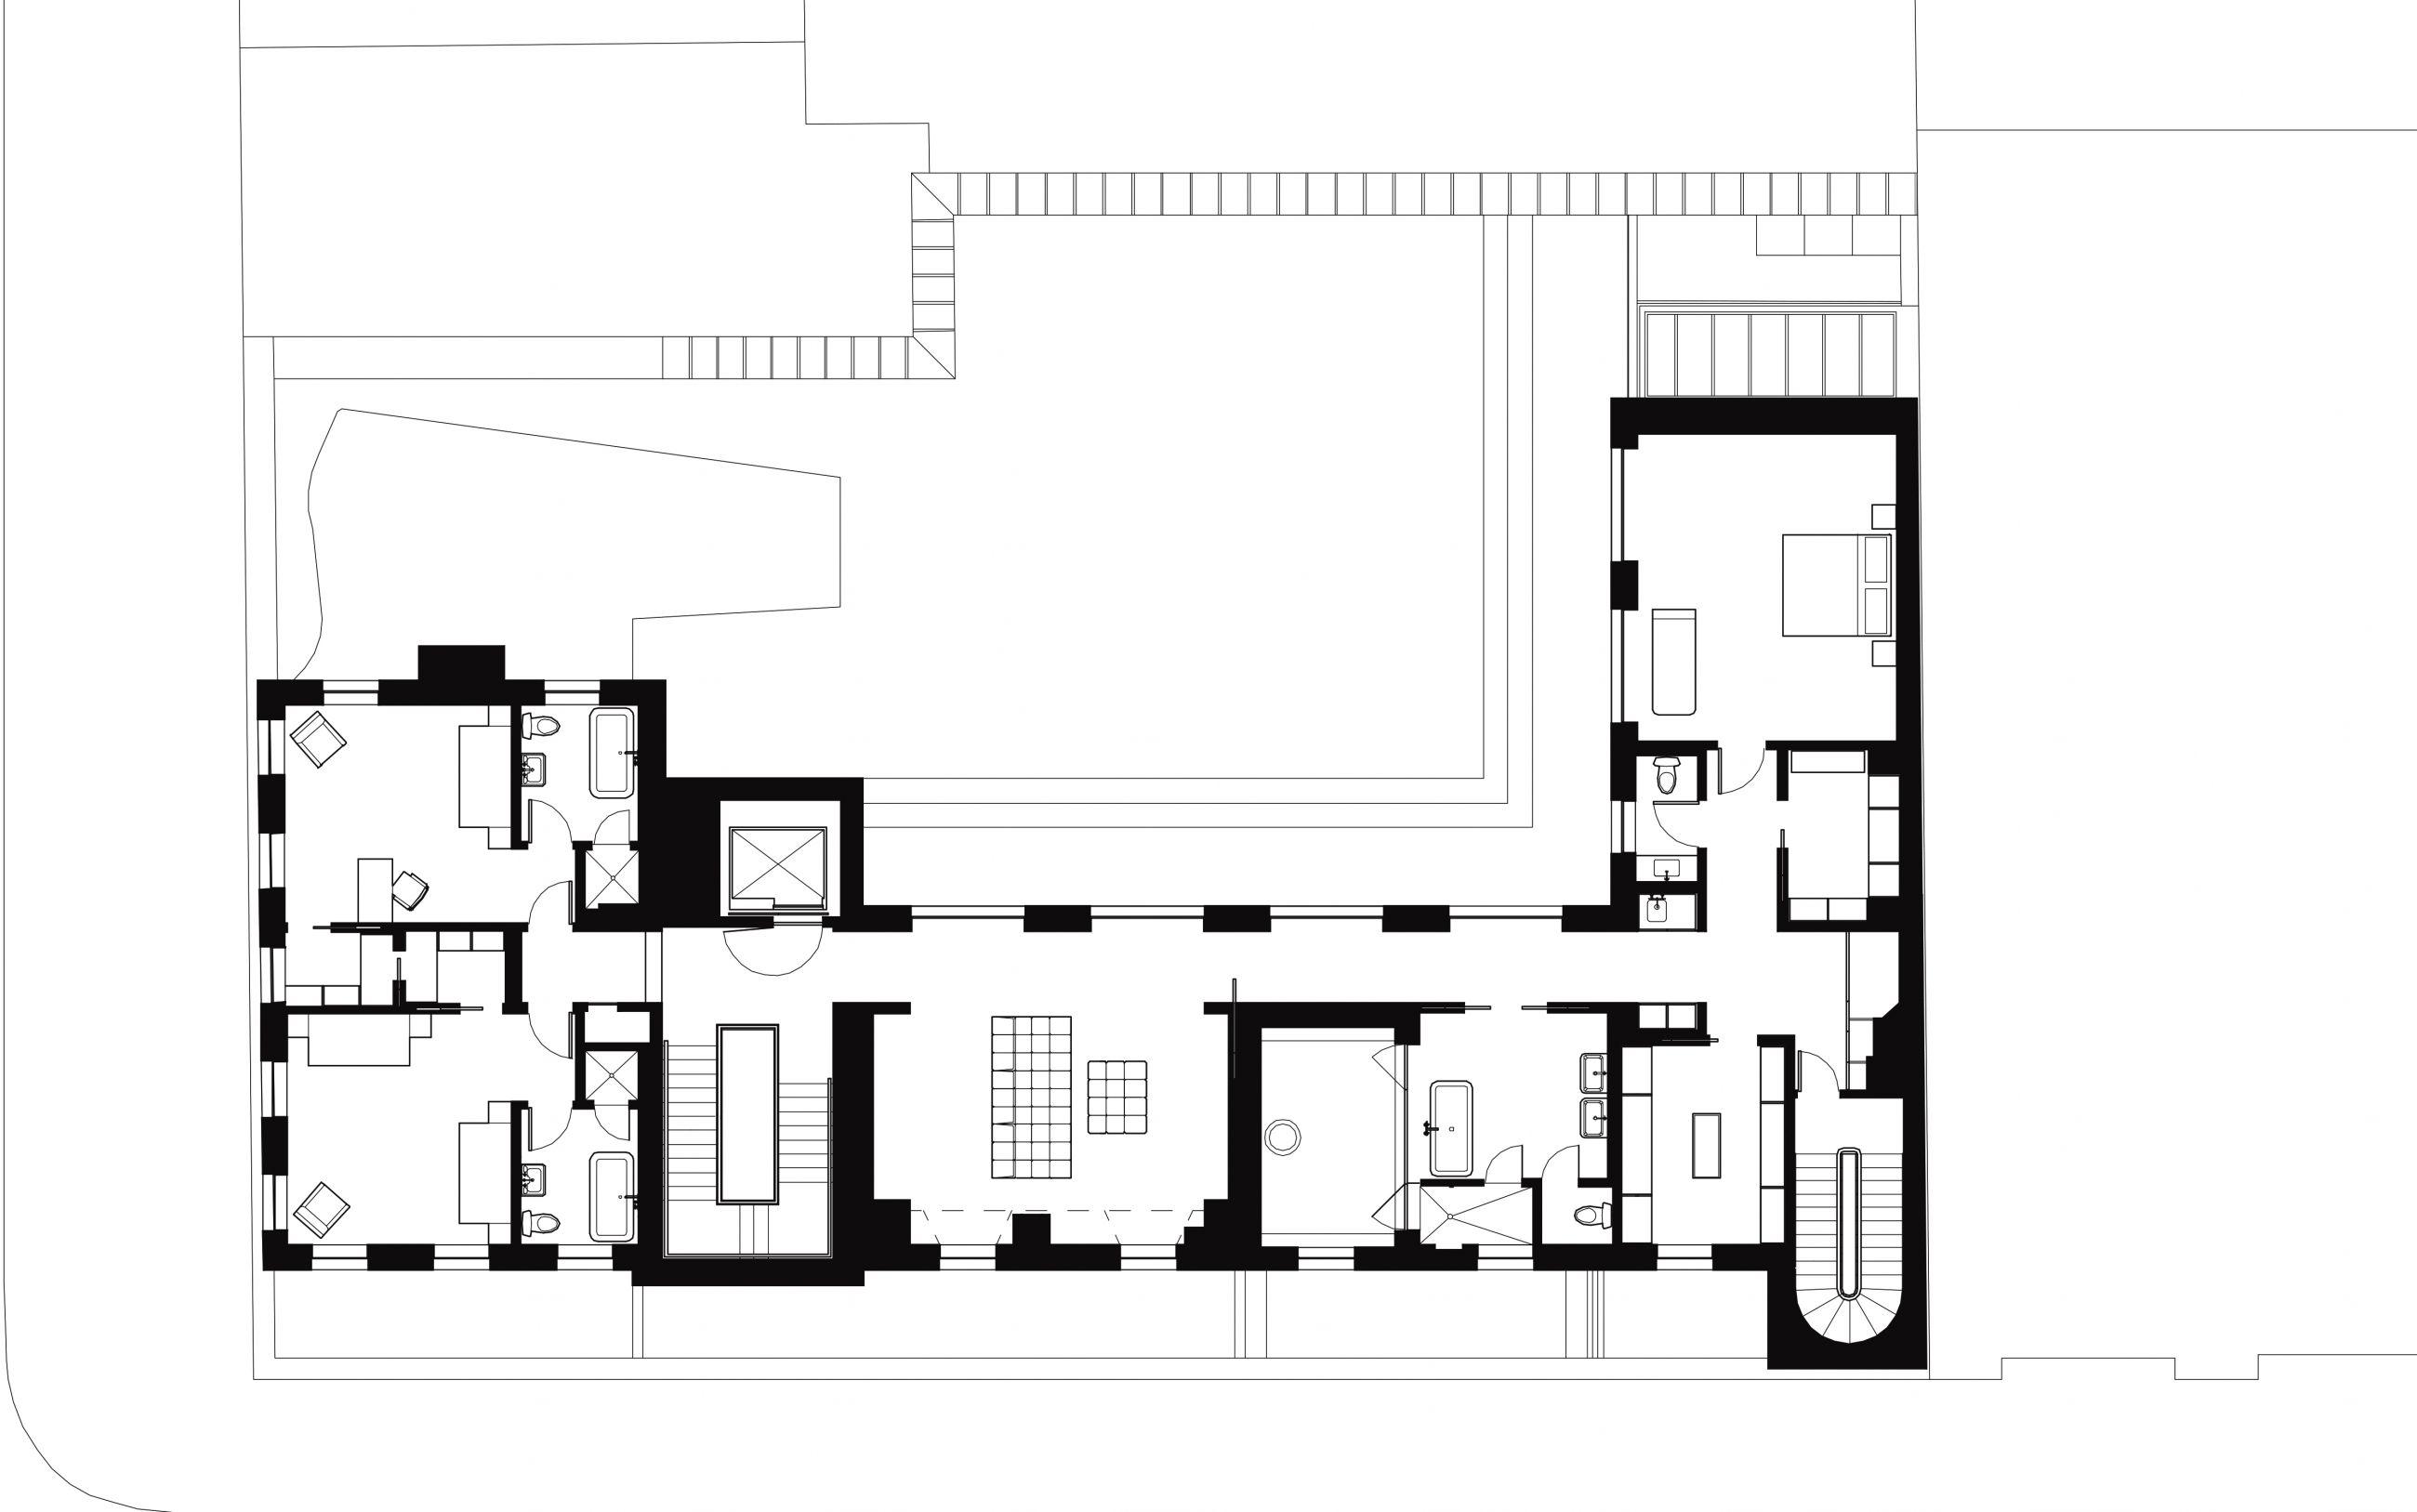 West Village Residence 3rd Floor Plan